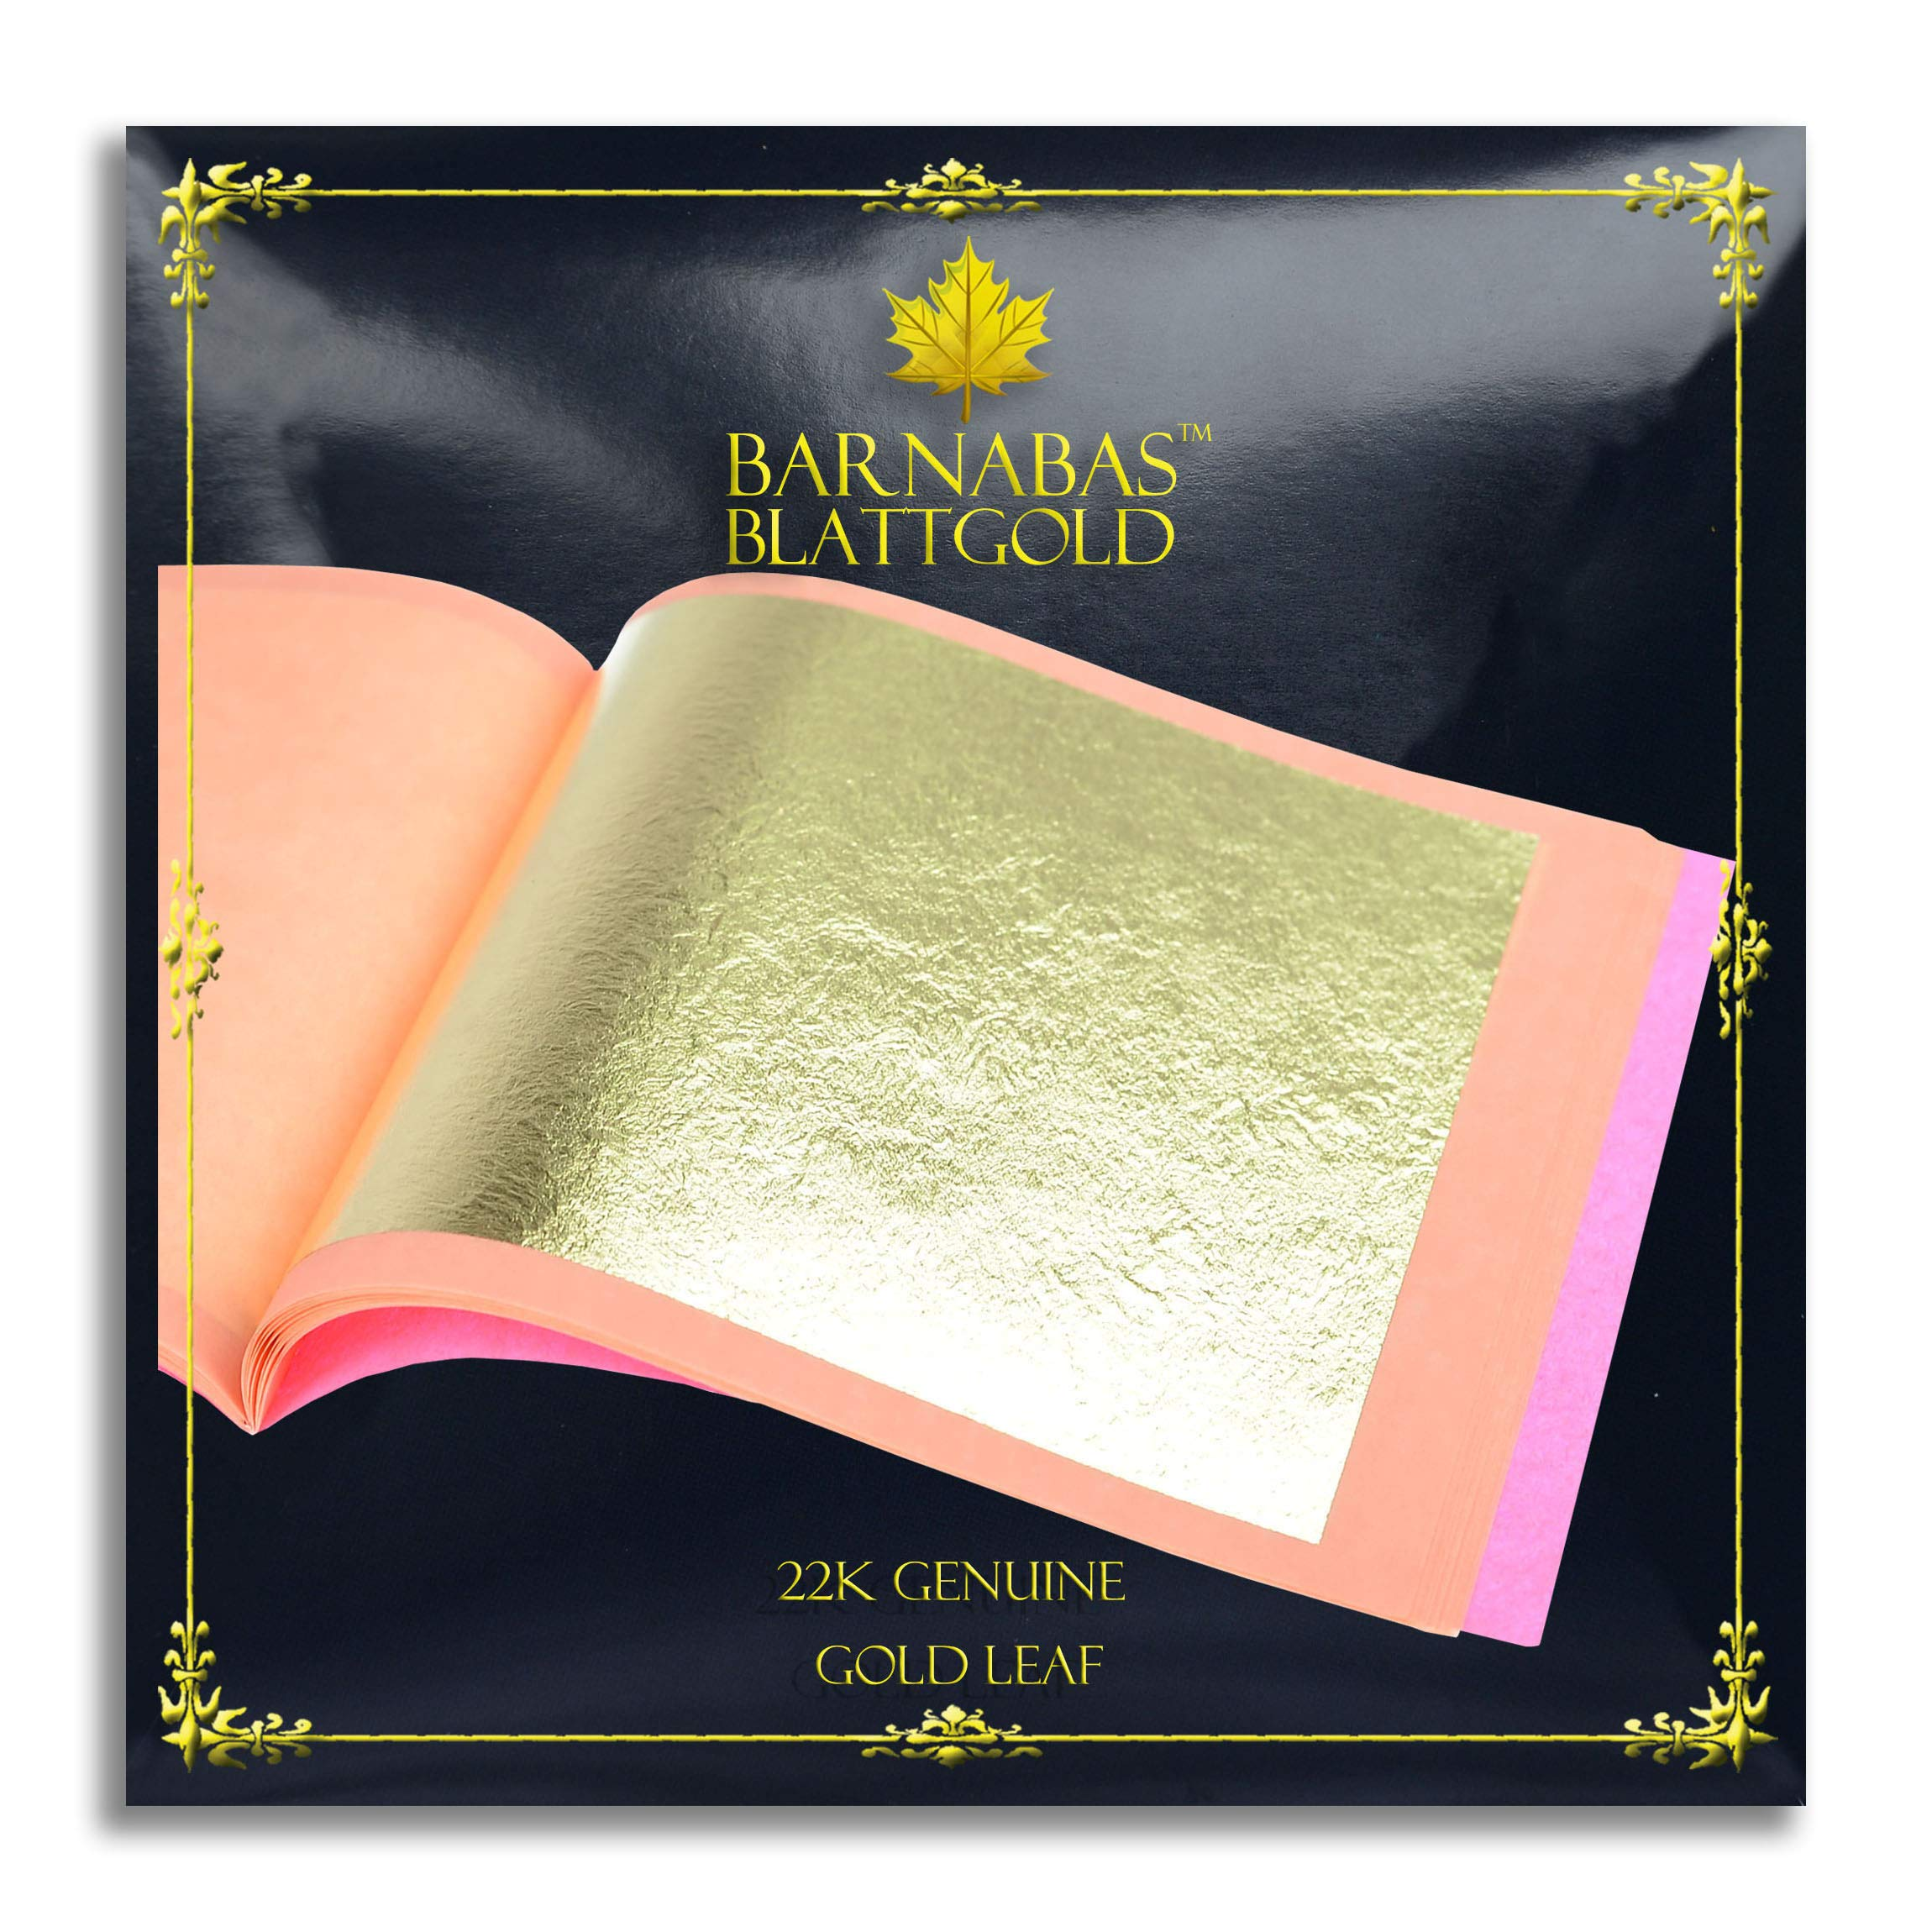 Genuine Gold Leaf Sheets 22k - by Barnabas Blattgold - 3.1 inches - 25 Sheets Booklet - Loose Leaf